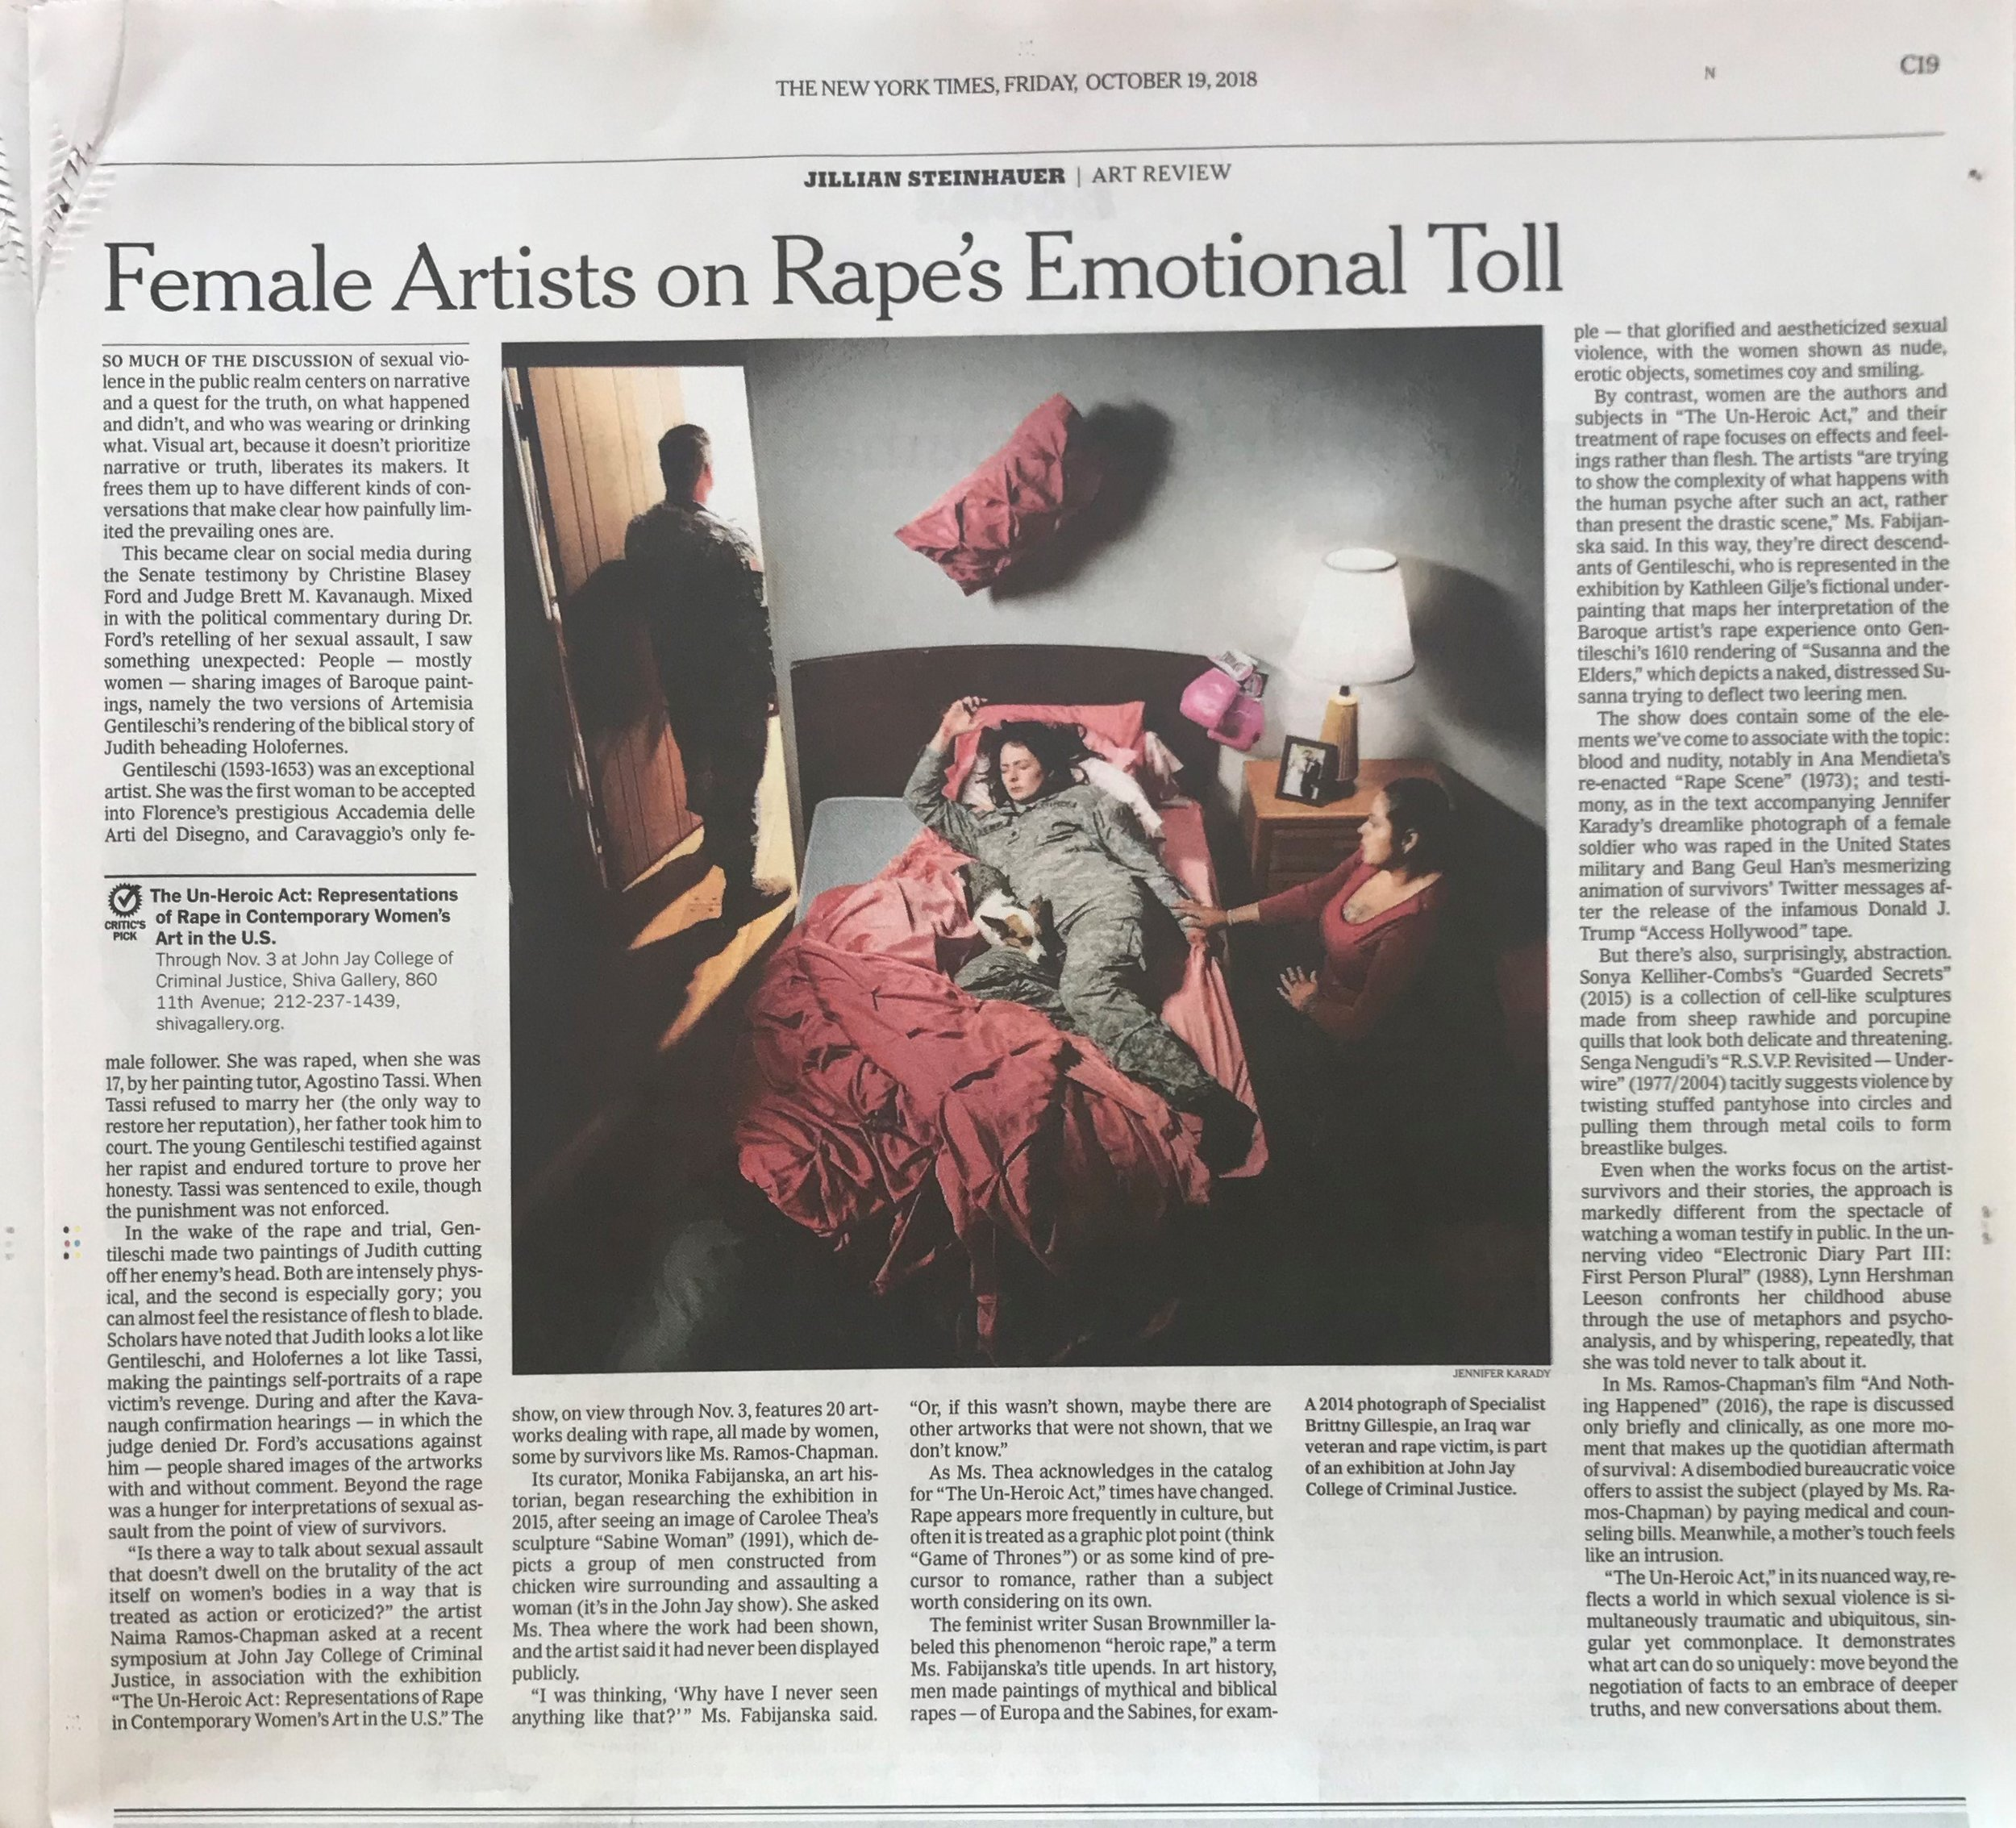 The New York Times:  Female Artists Strip Rape of Its 'Heroic' Underpinnings , by Jillian Steinhauer, October 16, 2018